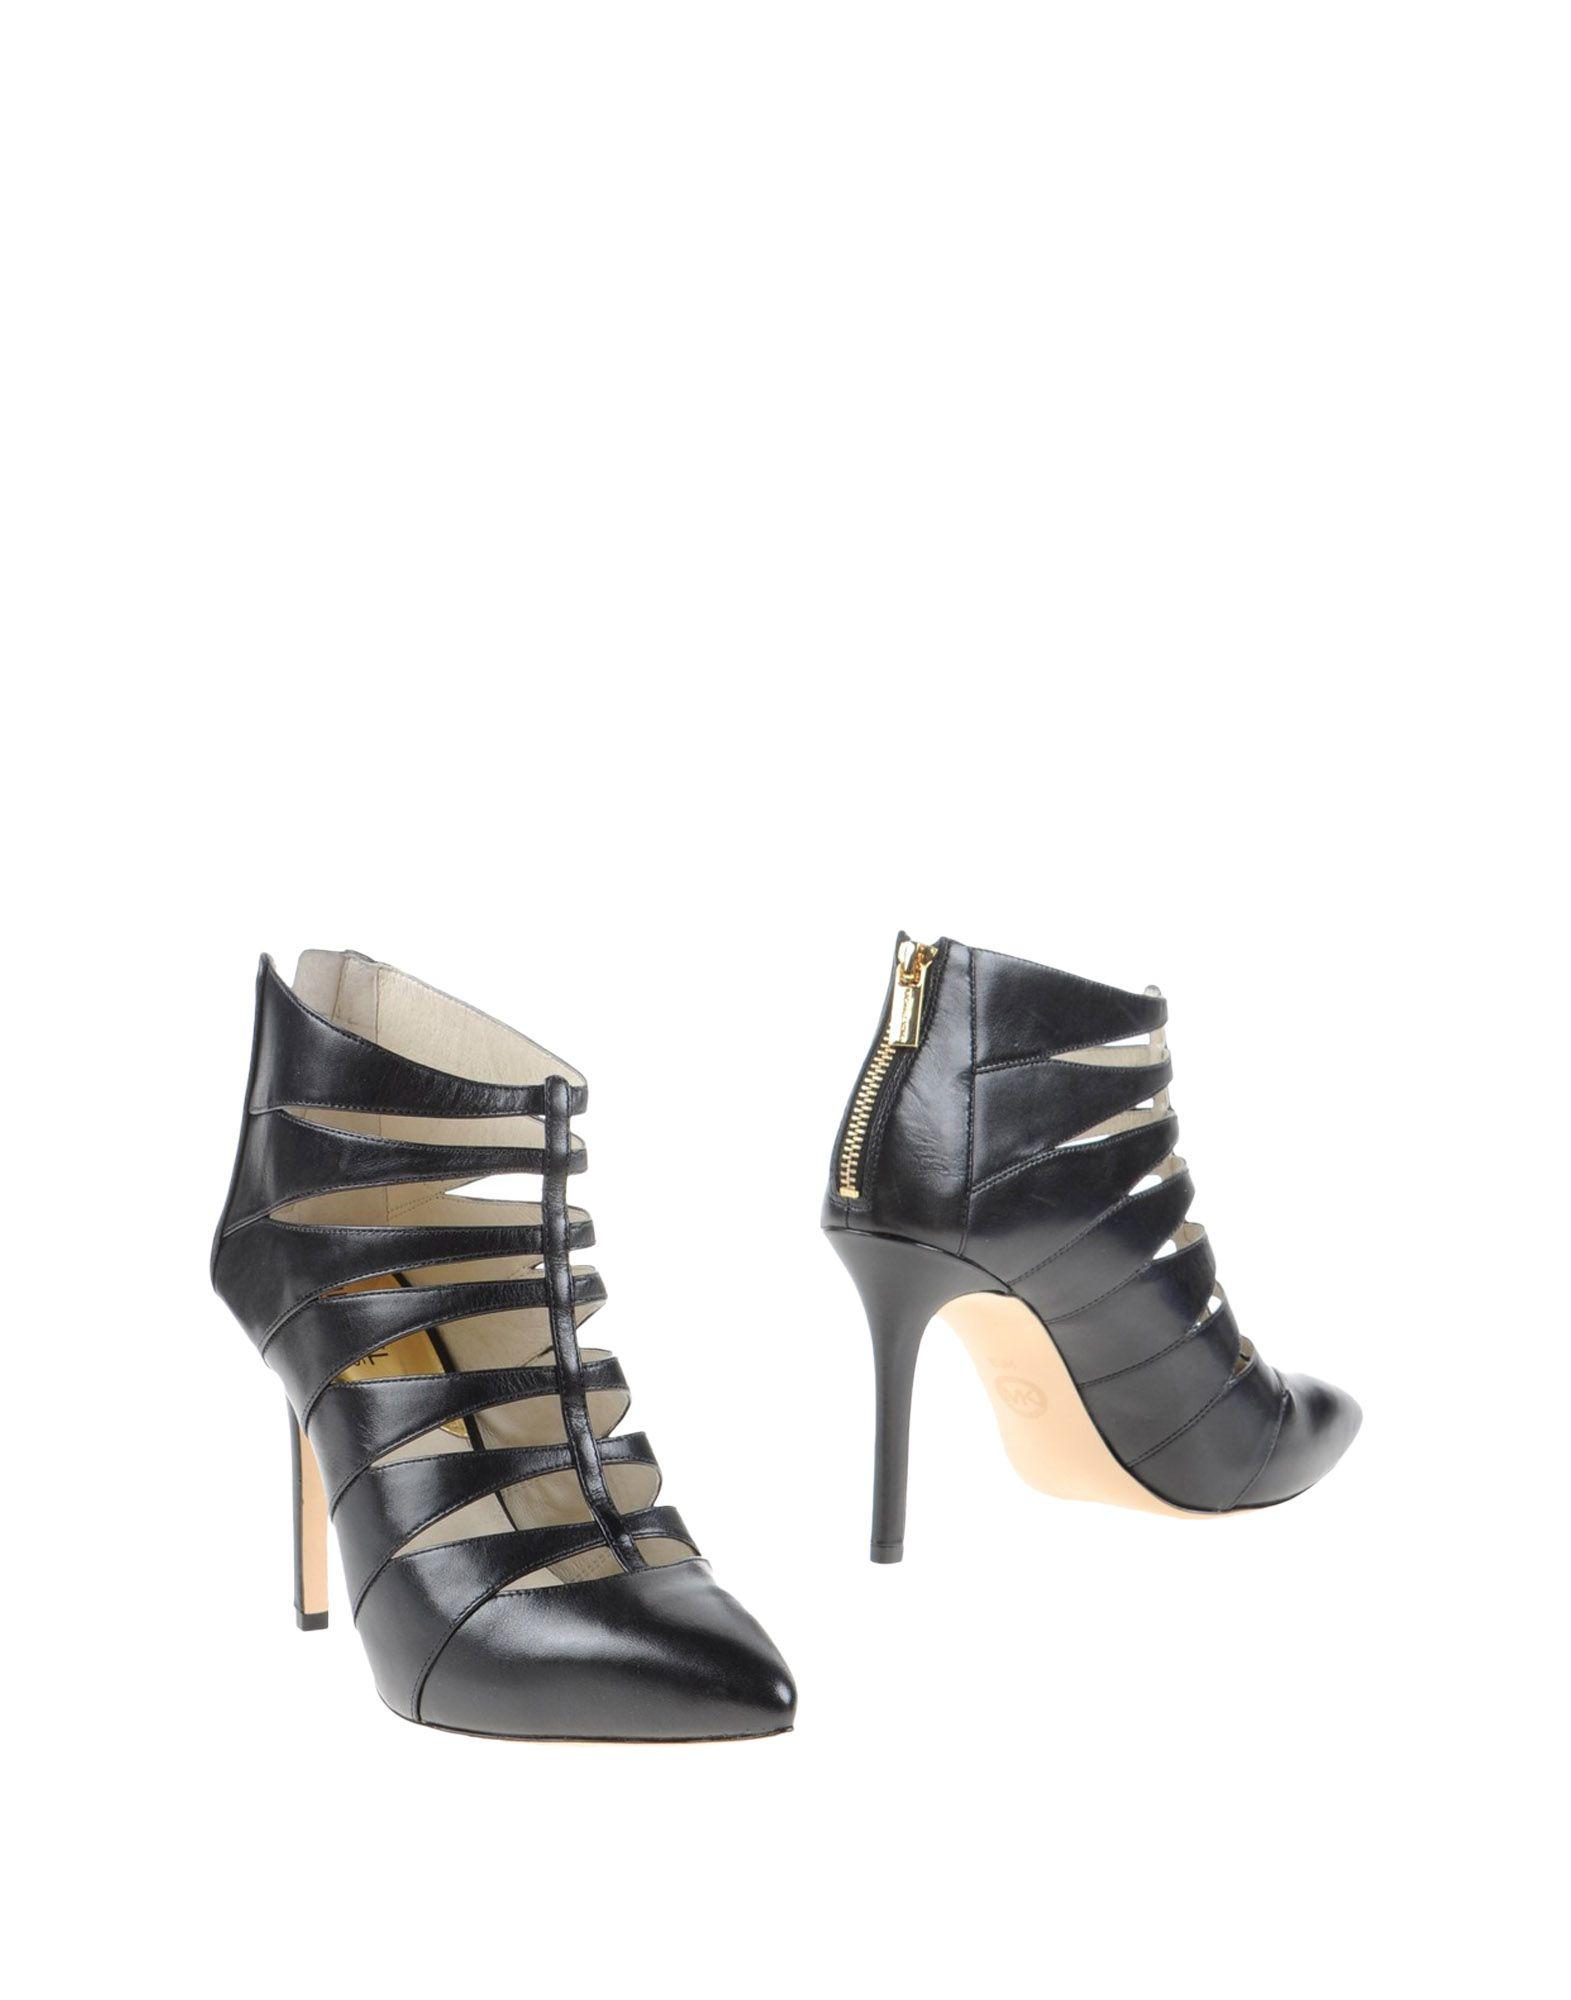 michael michael kors ankle boots in black lyst. Black Bedroom Furniture Sets. Home Design Ideas